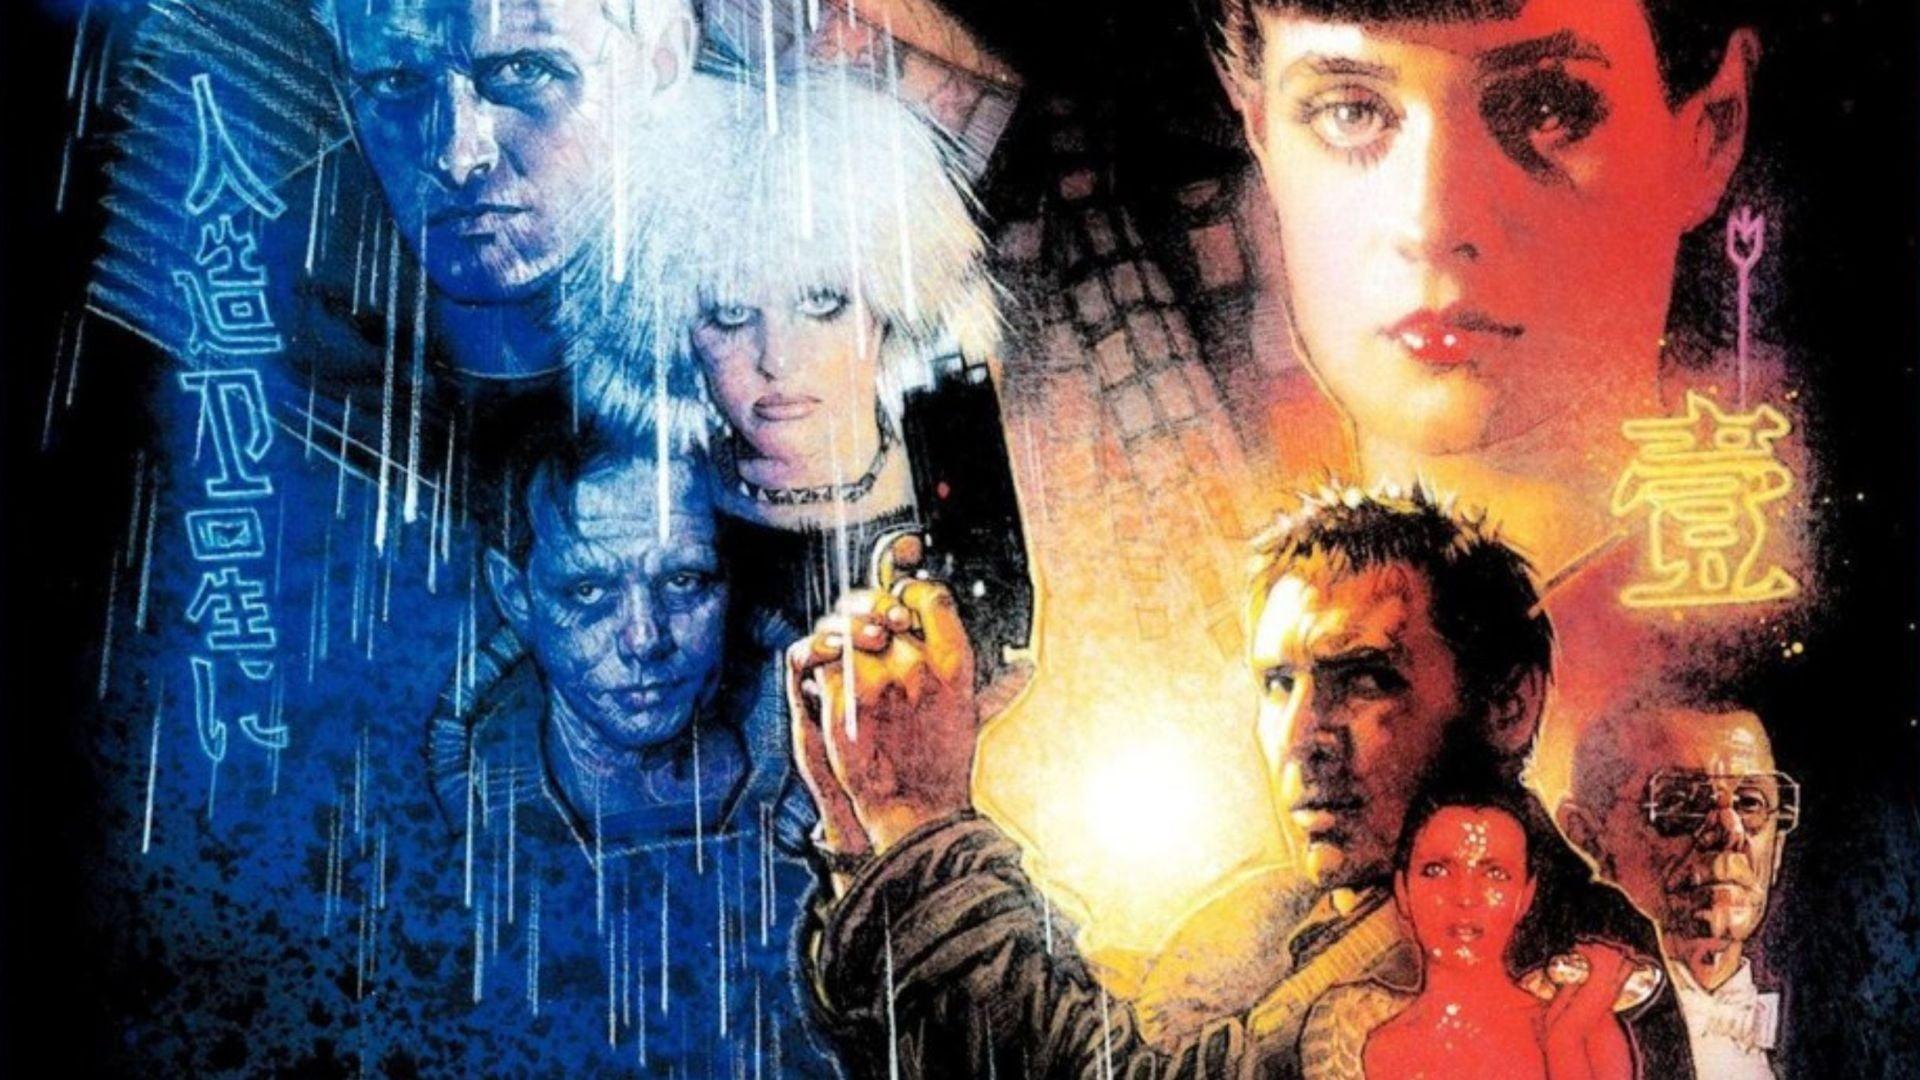 Blade Runner 2 se titulará Blade Runner 2049 - Cine Actual - photo#31